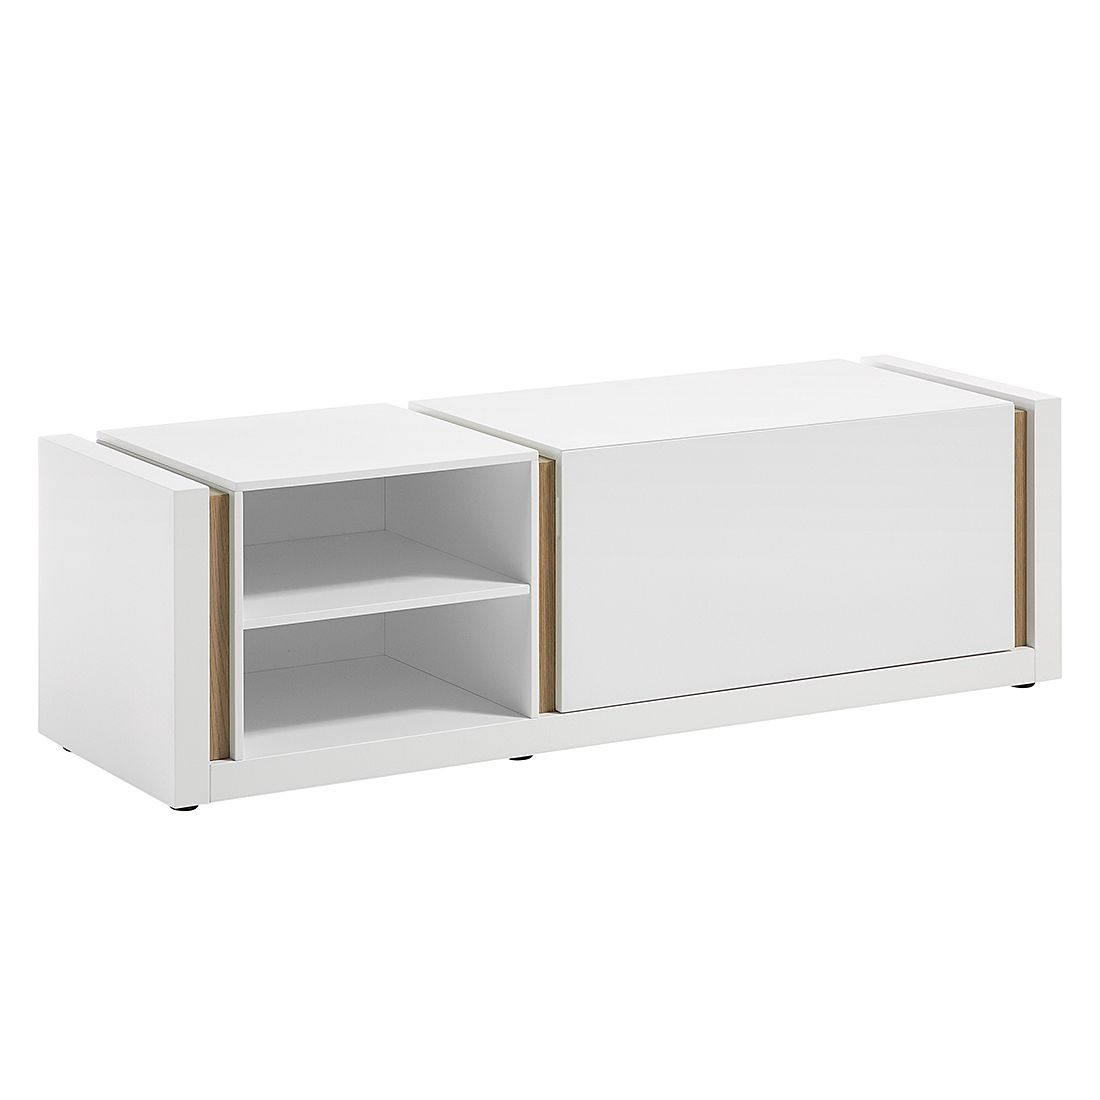 lowboard wei matt preis vergleich 2016. Black Bedroom Furniture Sets. Home Design Ideas